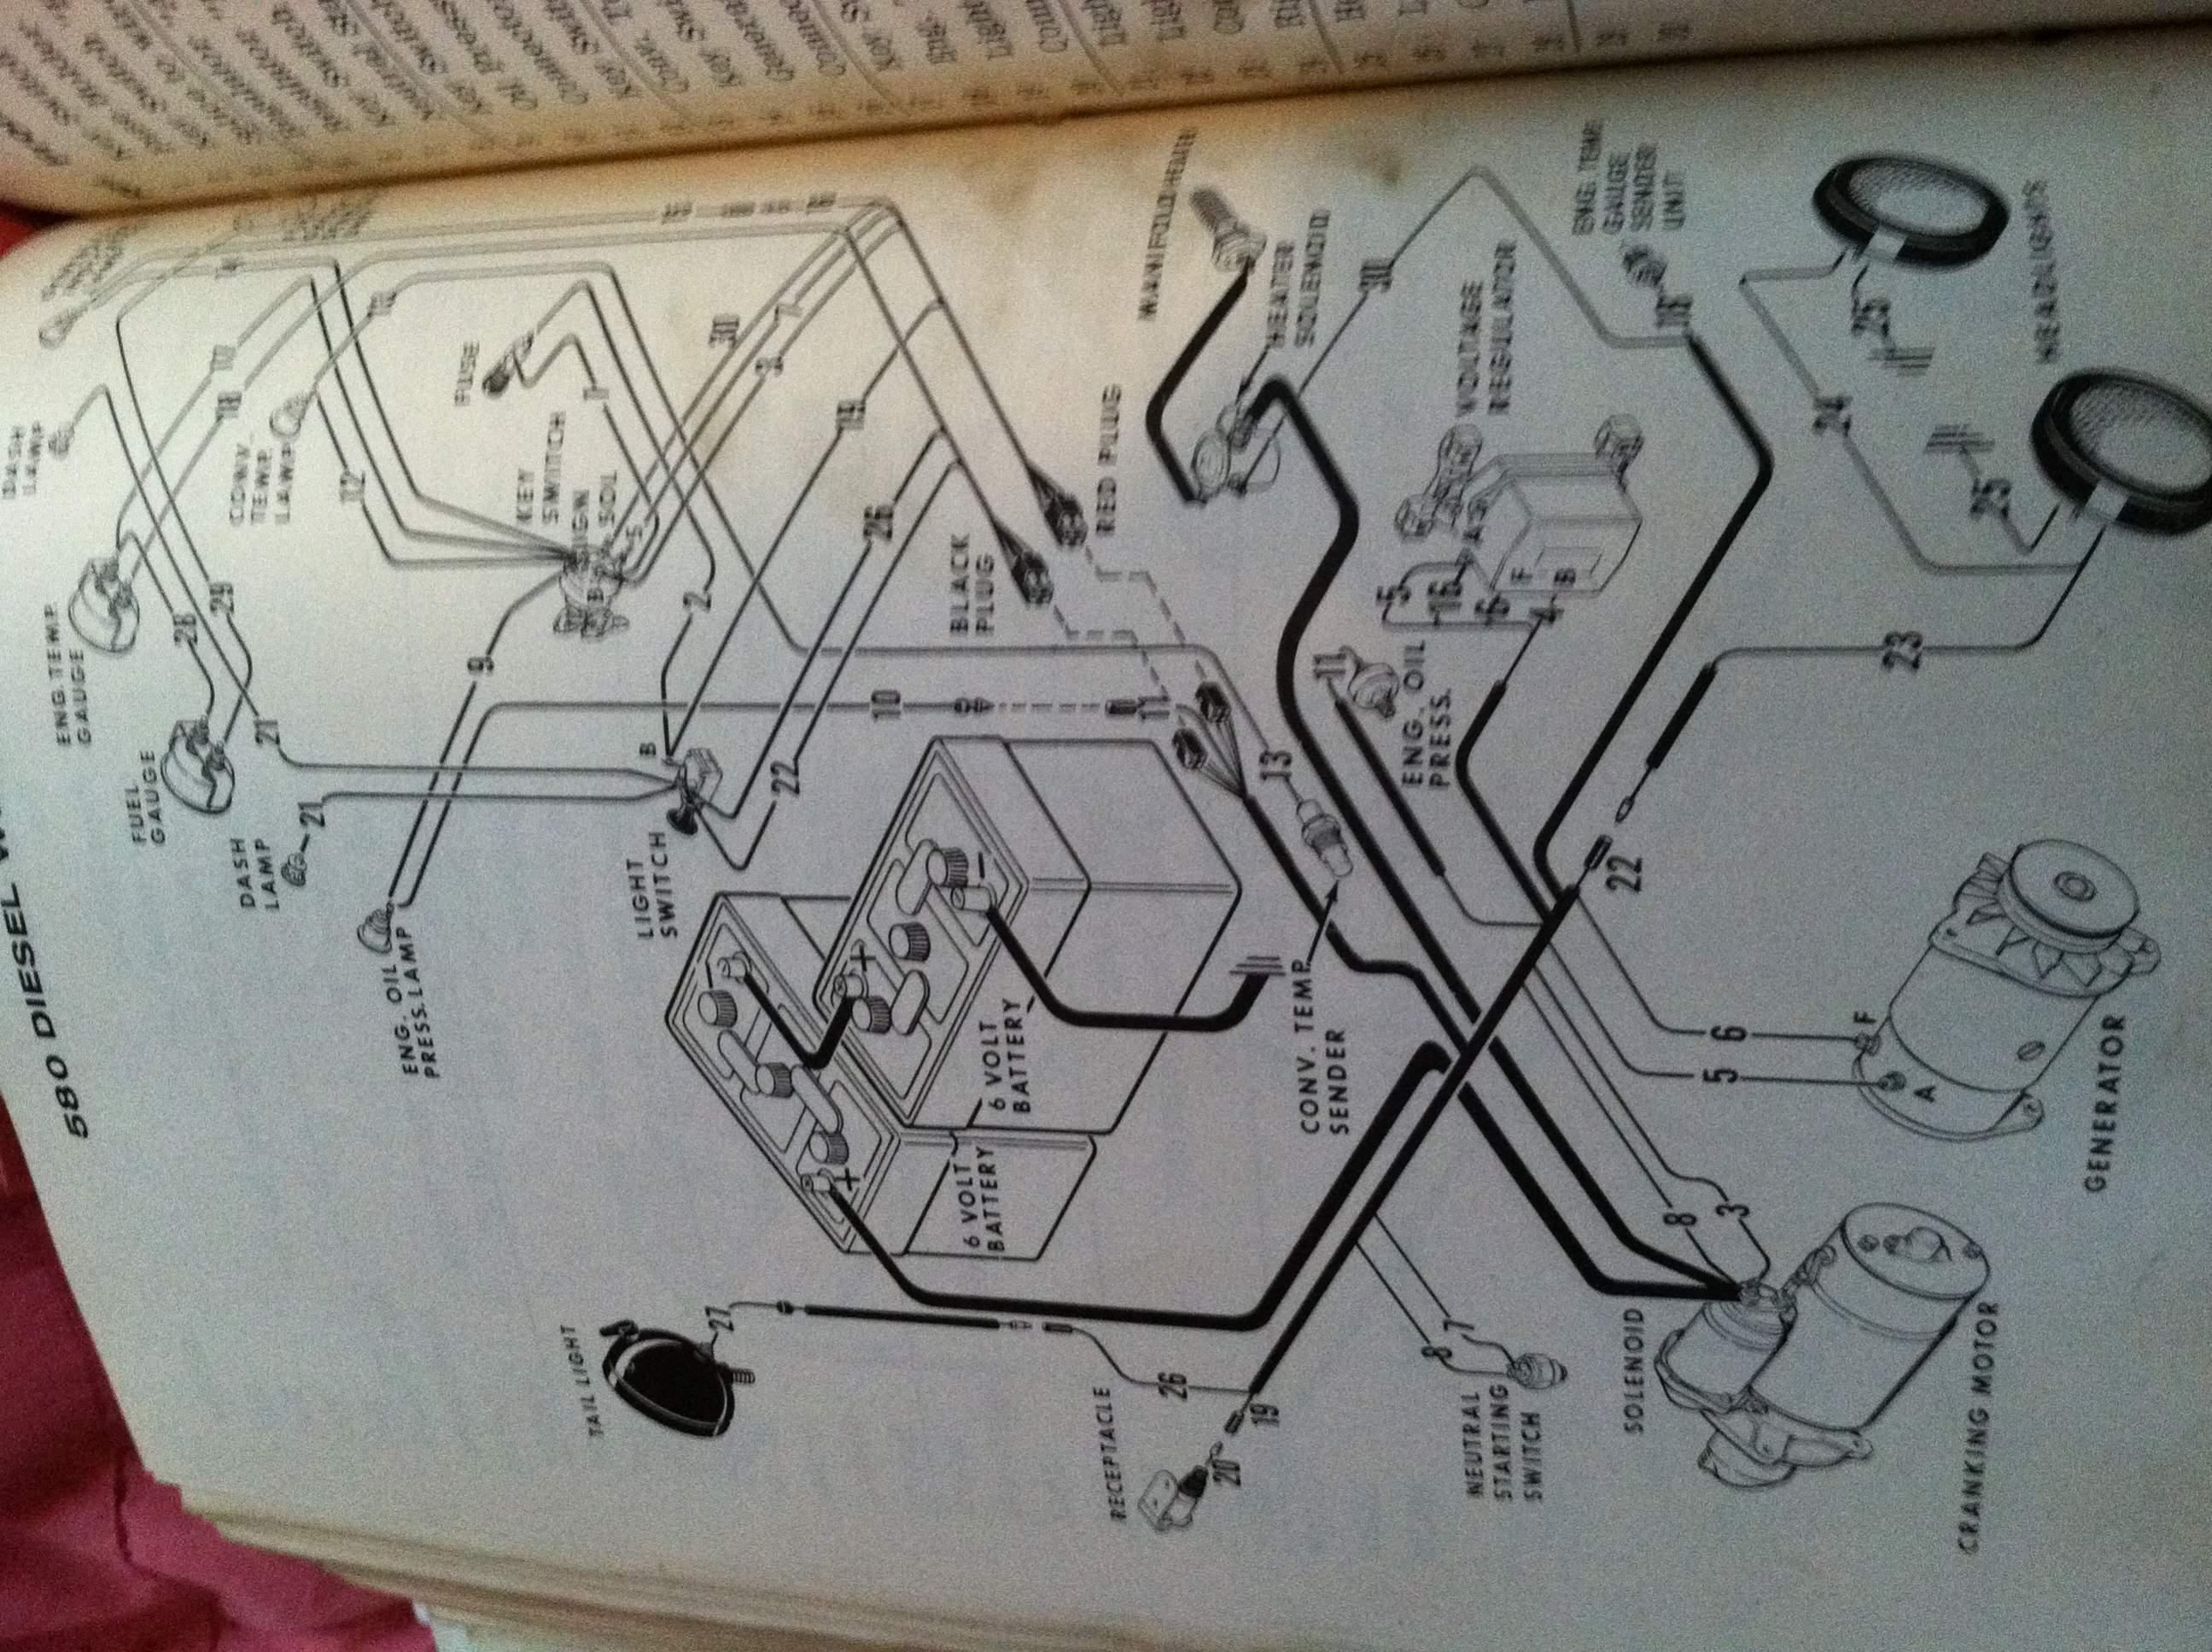 1998 Case 580 Super L Wiring Diagram - Syclone Wiring Diagram for Wiring  Diagram Schematics | 1998 Case 580 Super L Wiring Diagram |  | Wiring Diagram Schematics